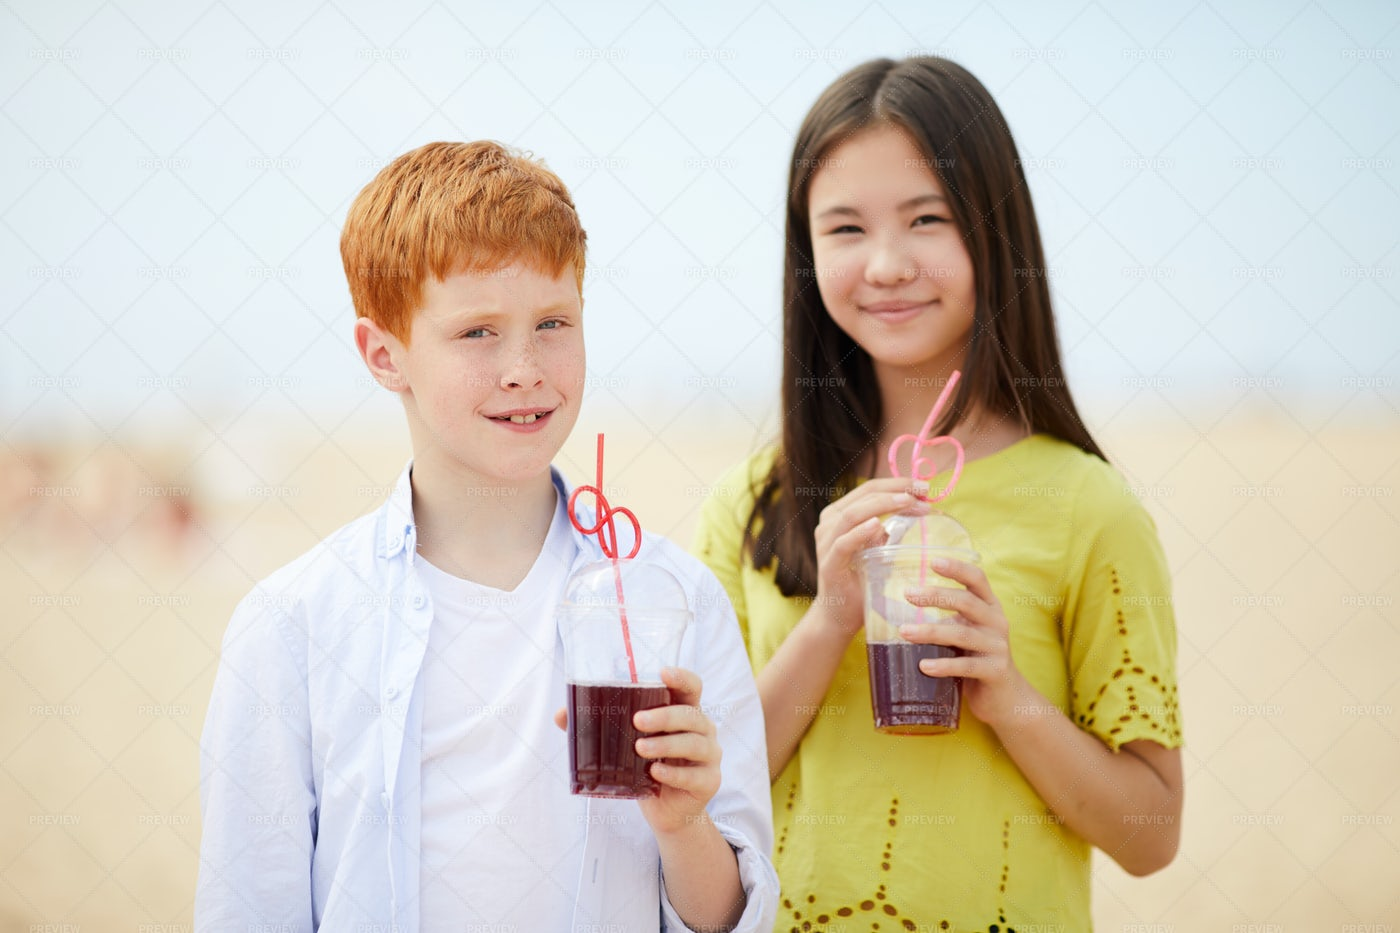 Interracial Children With Summer...: Stock Photos